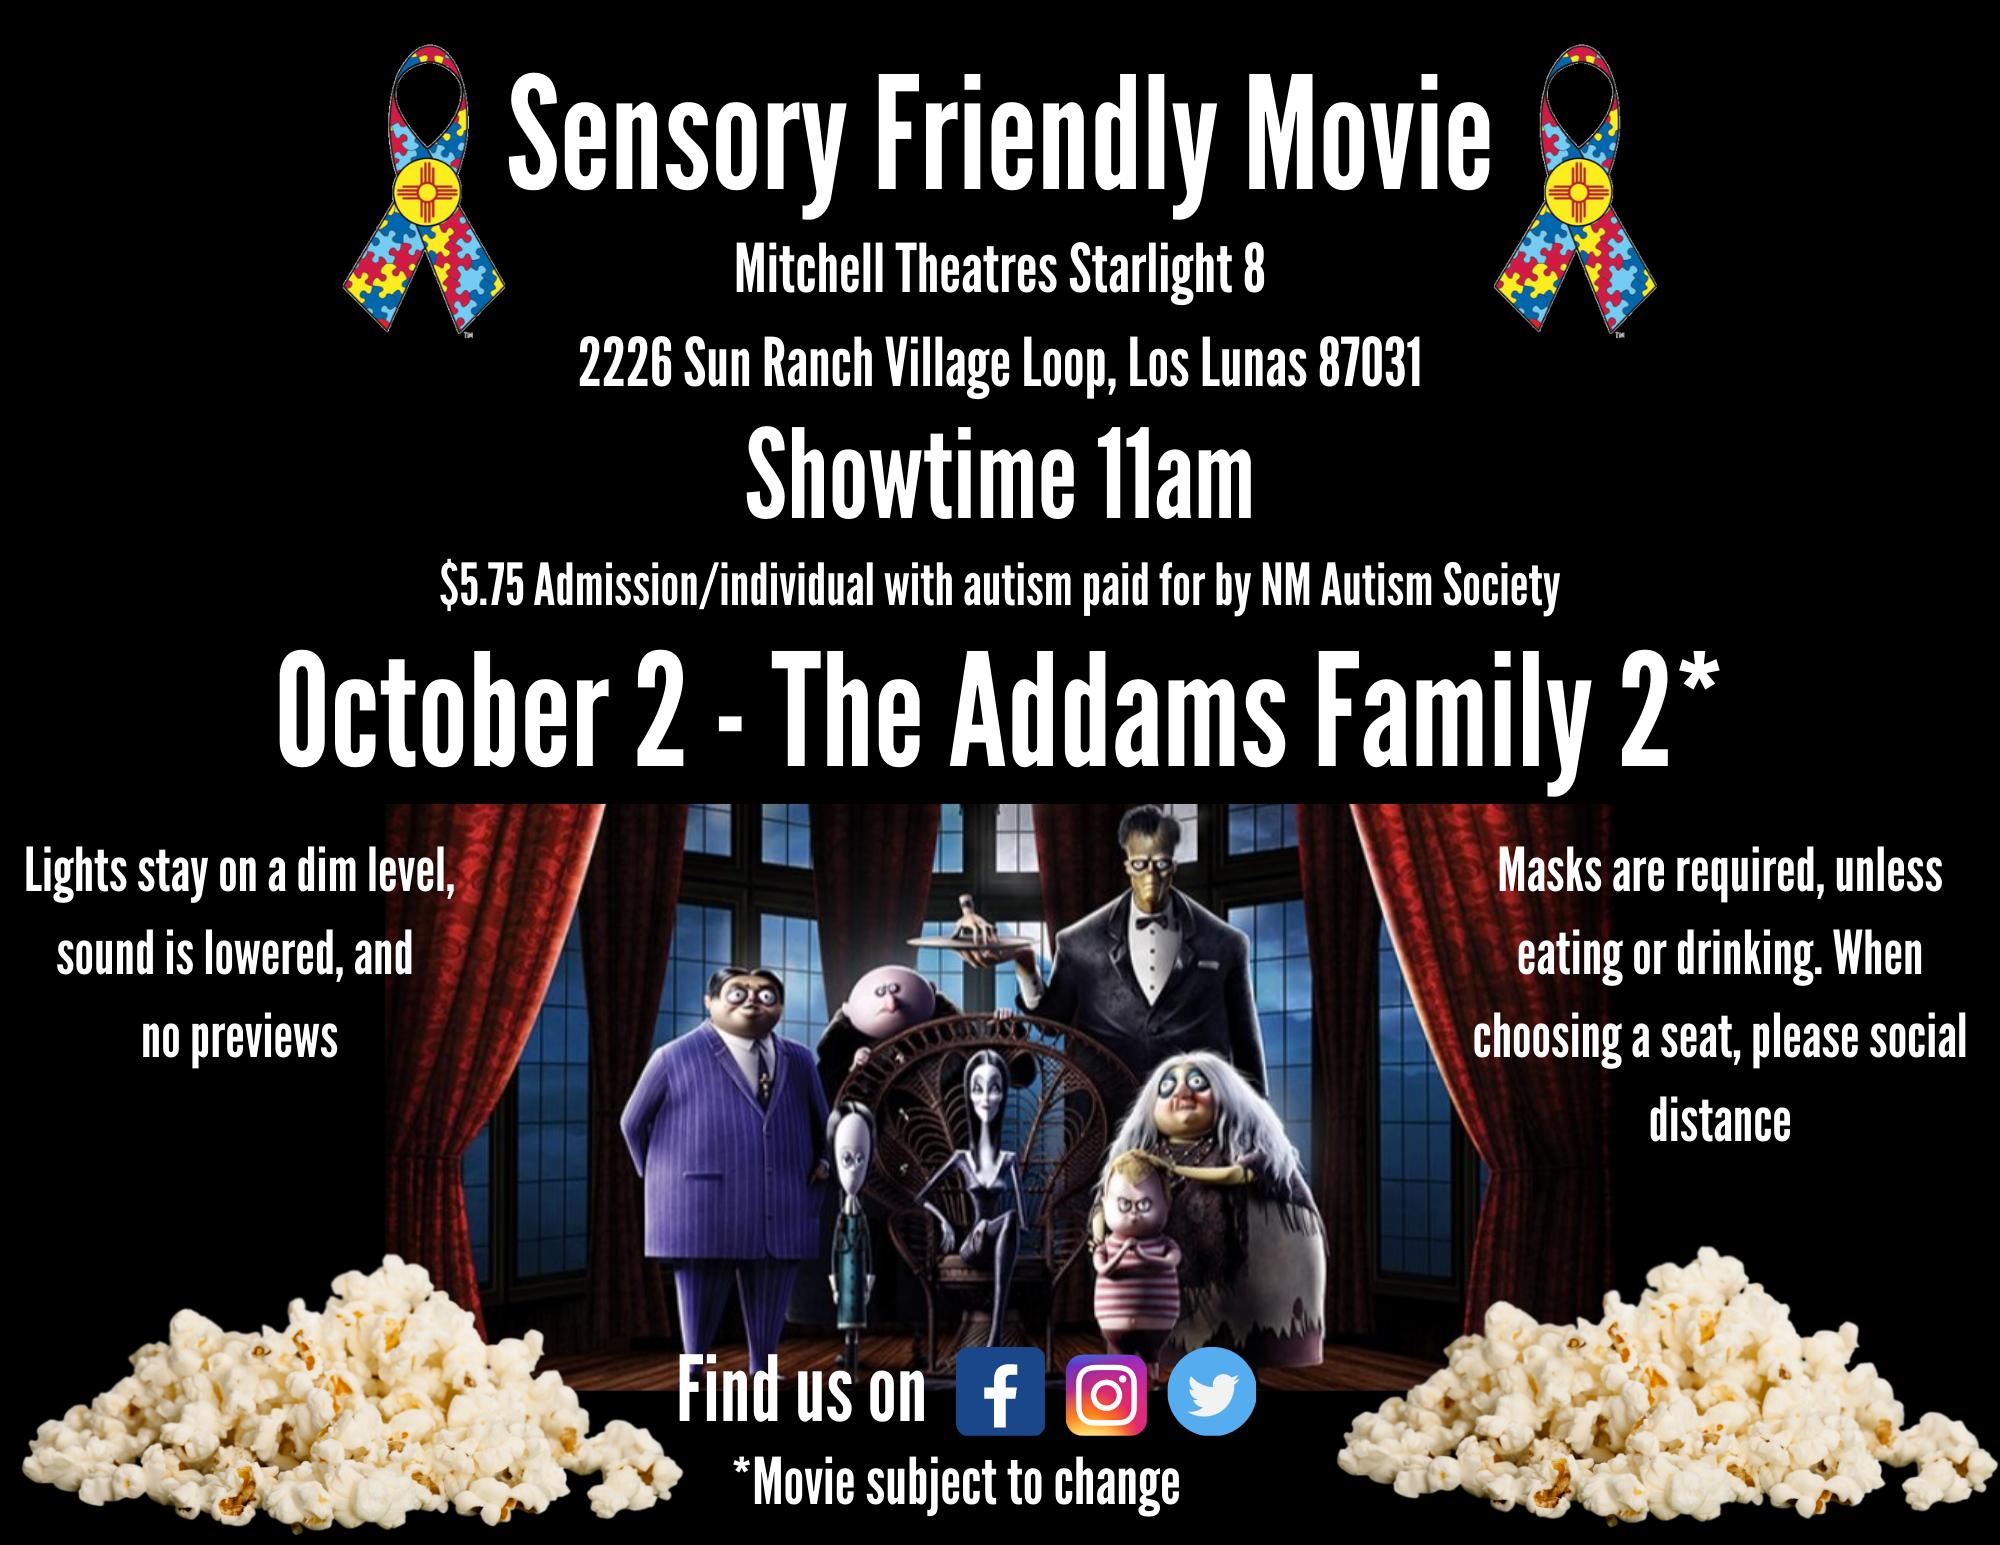 Sensory Friendly Movie - The Addams Family 2 Image